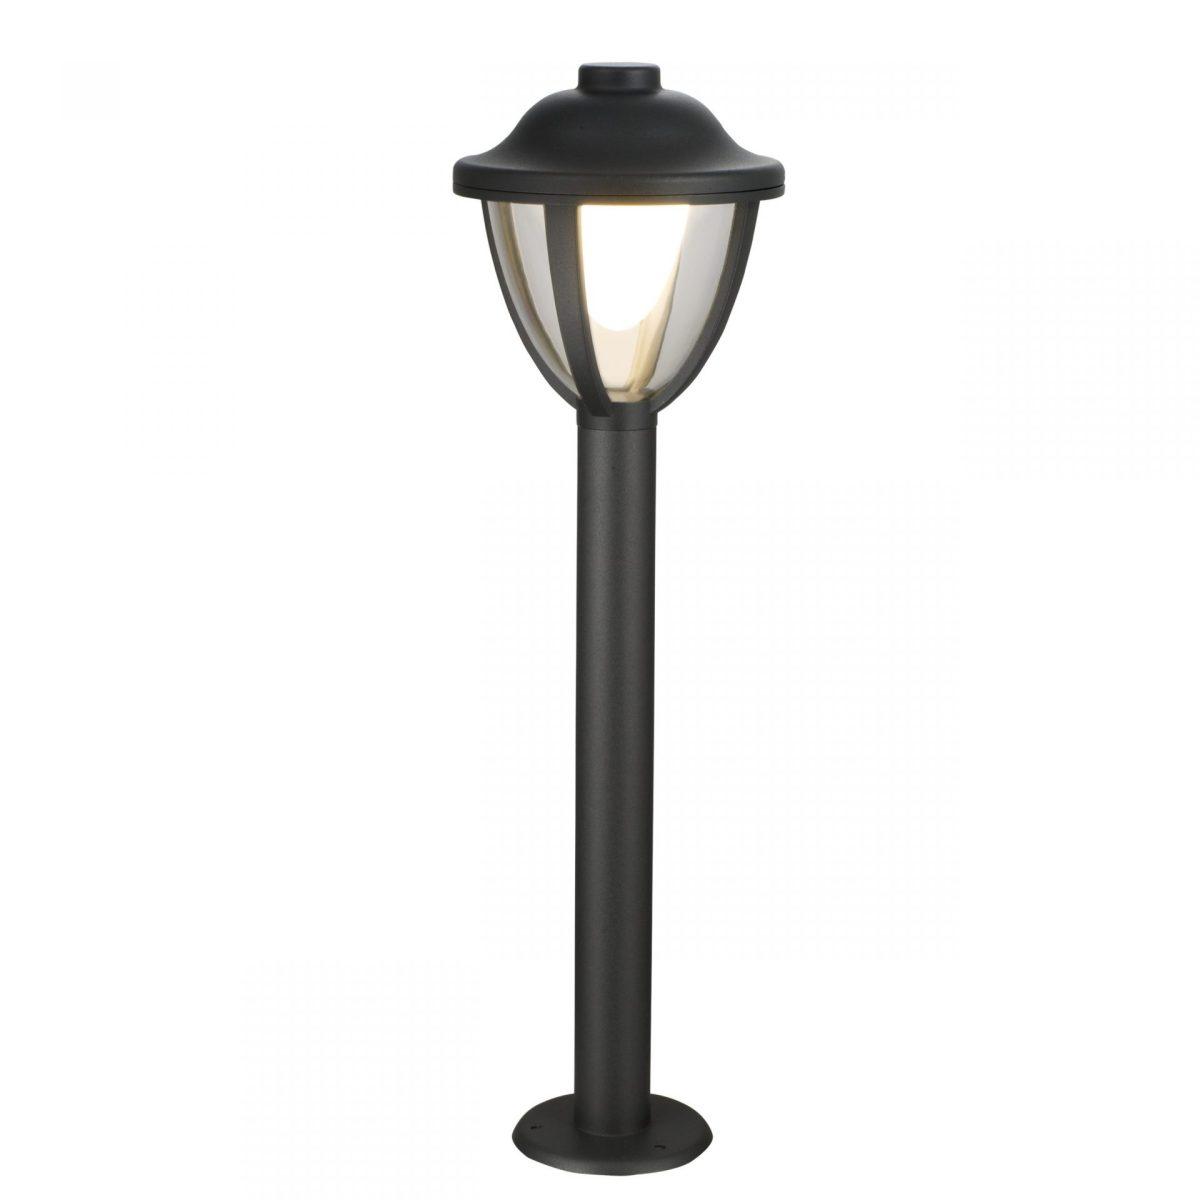 Outdoor Lighting Paving WL-L22 – COMING SOON